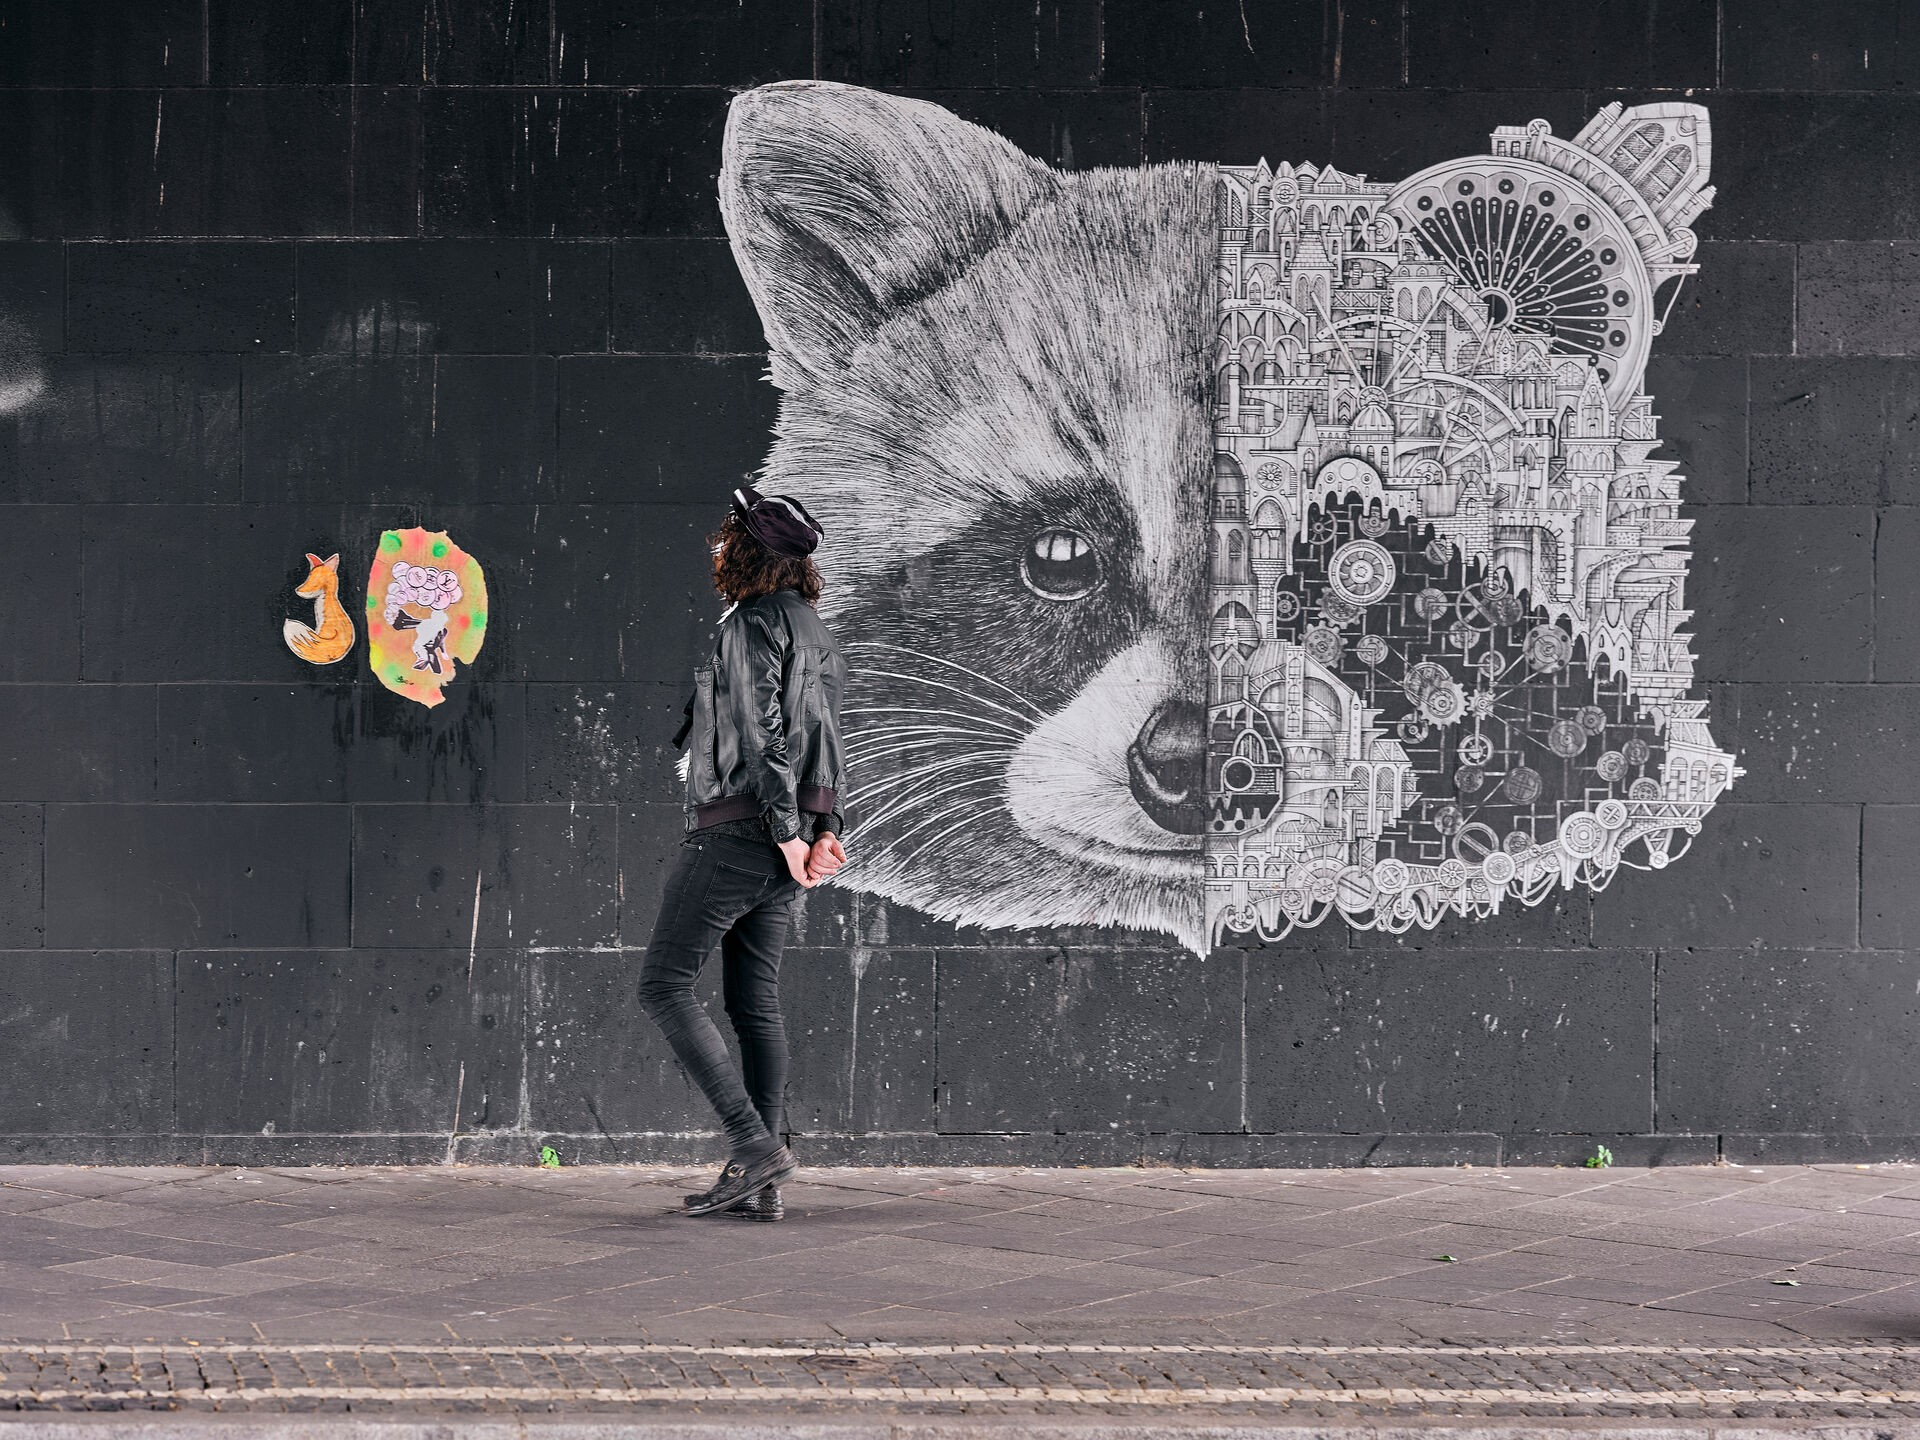 Étonnant Urban Art in Düsseldorf - experience Streetart IO-91